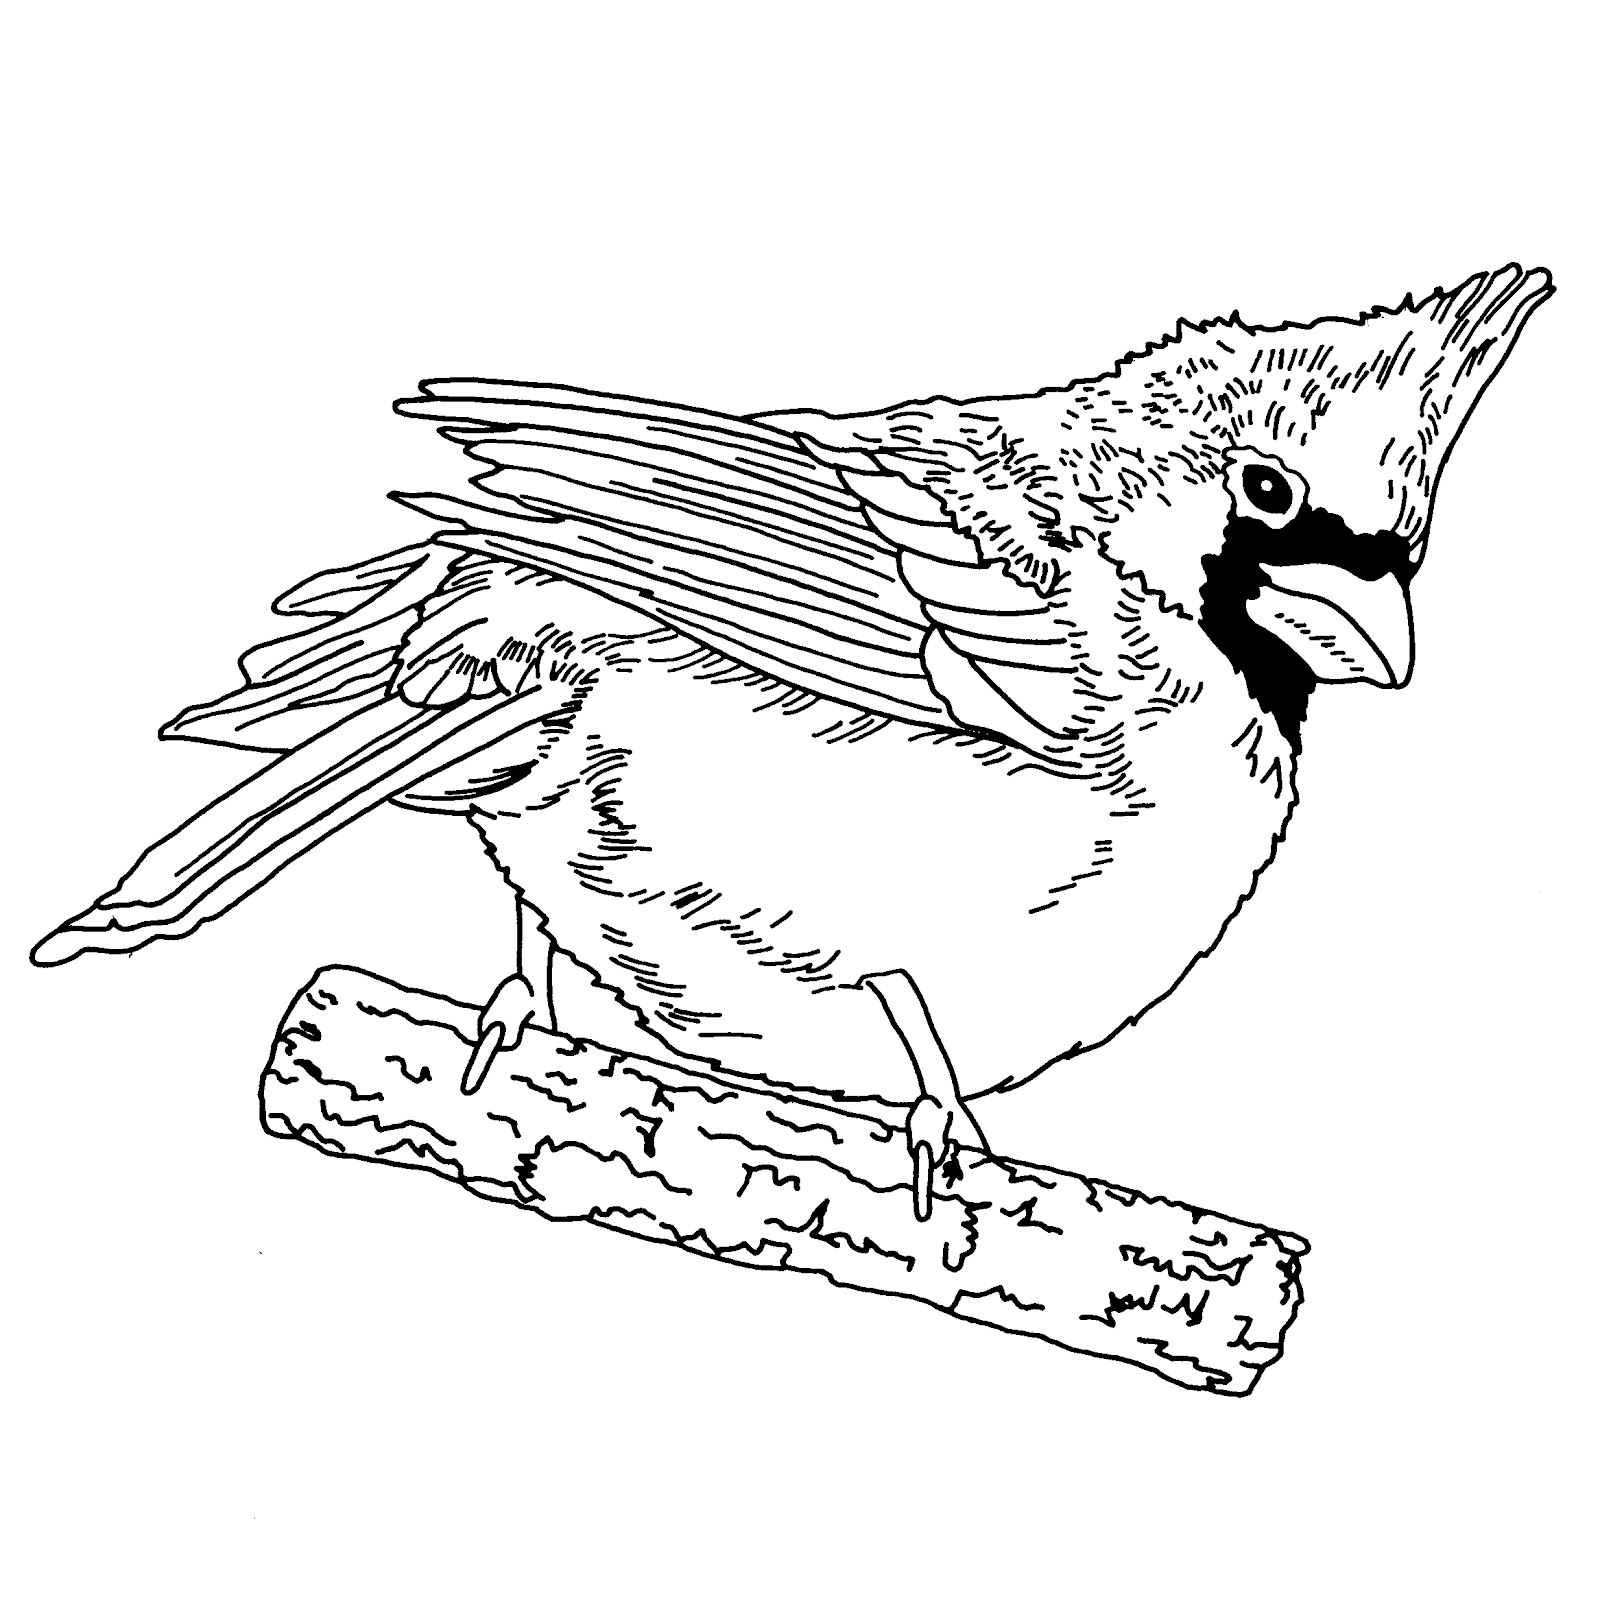 cardinls coloring pages | DZ Doodles Digital Stamps: Oodles of Doodles News! A ...